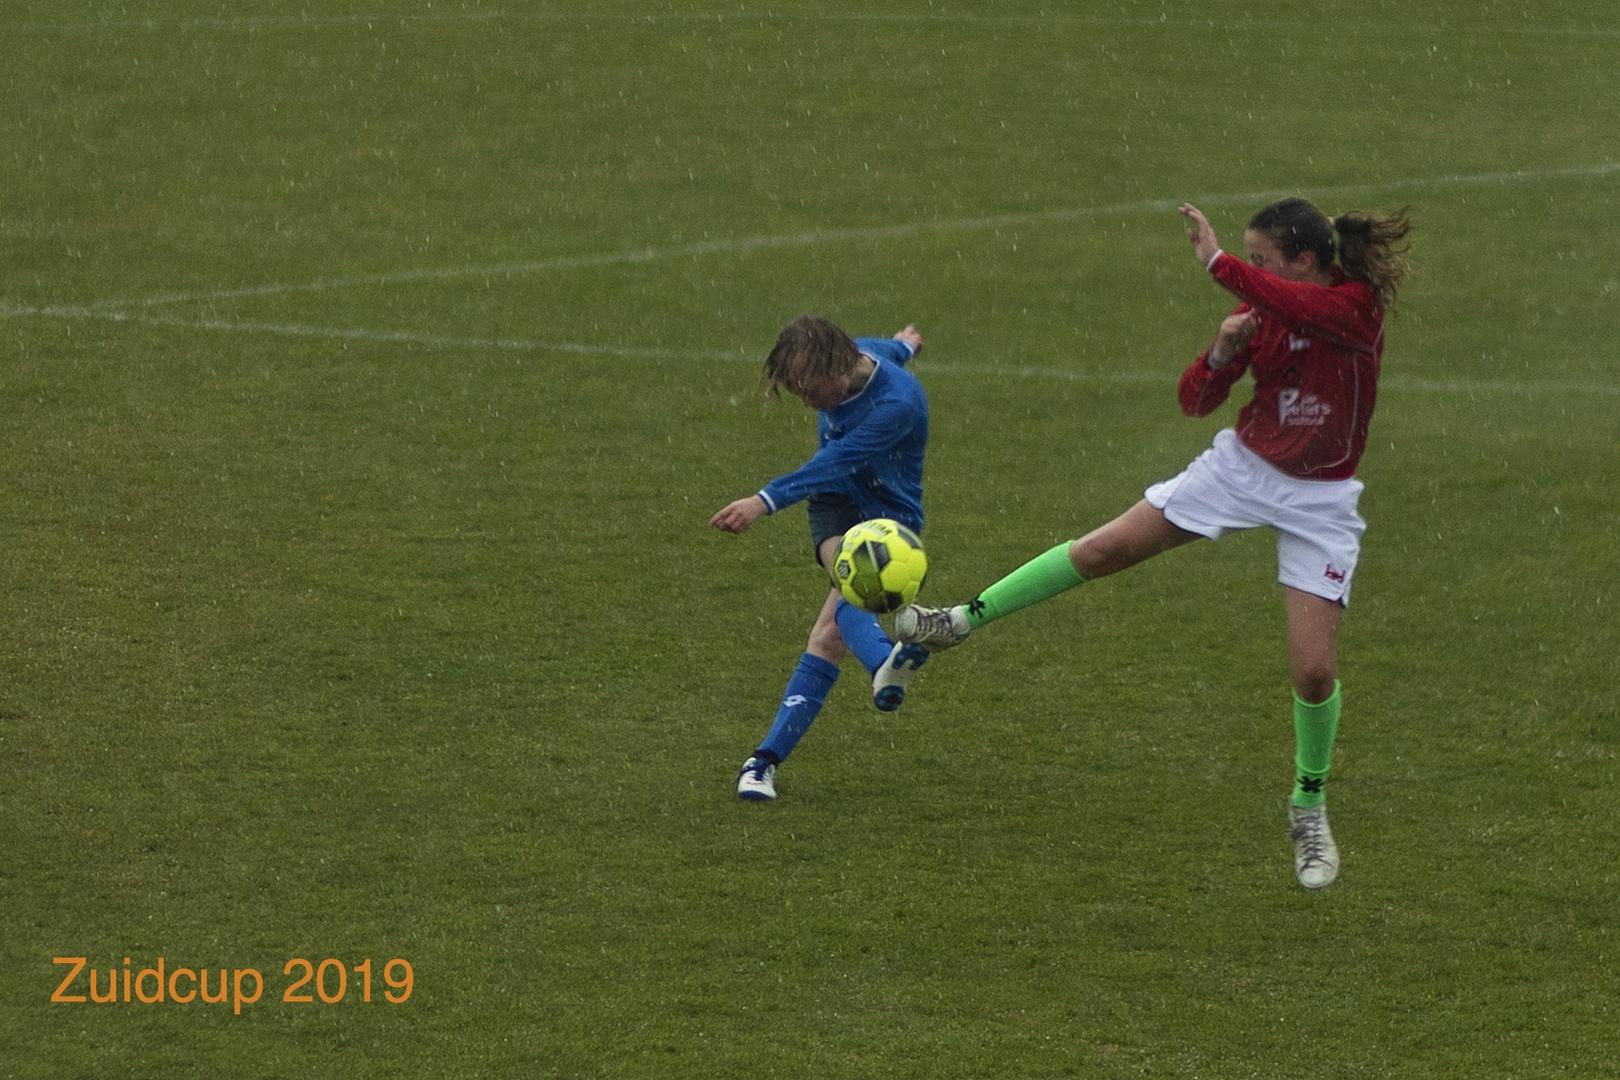 Zuidcup 2019